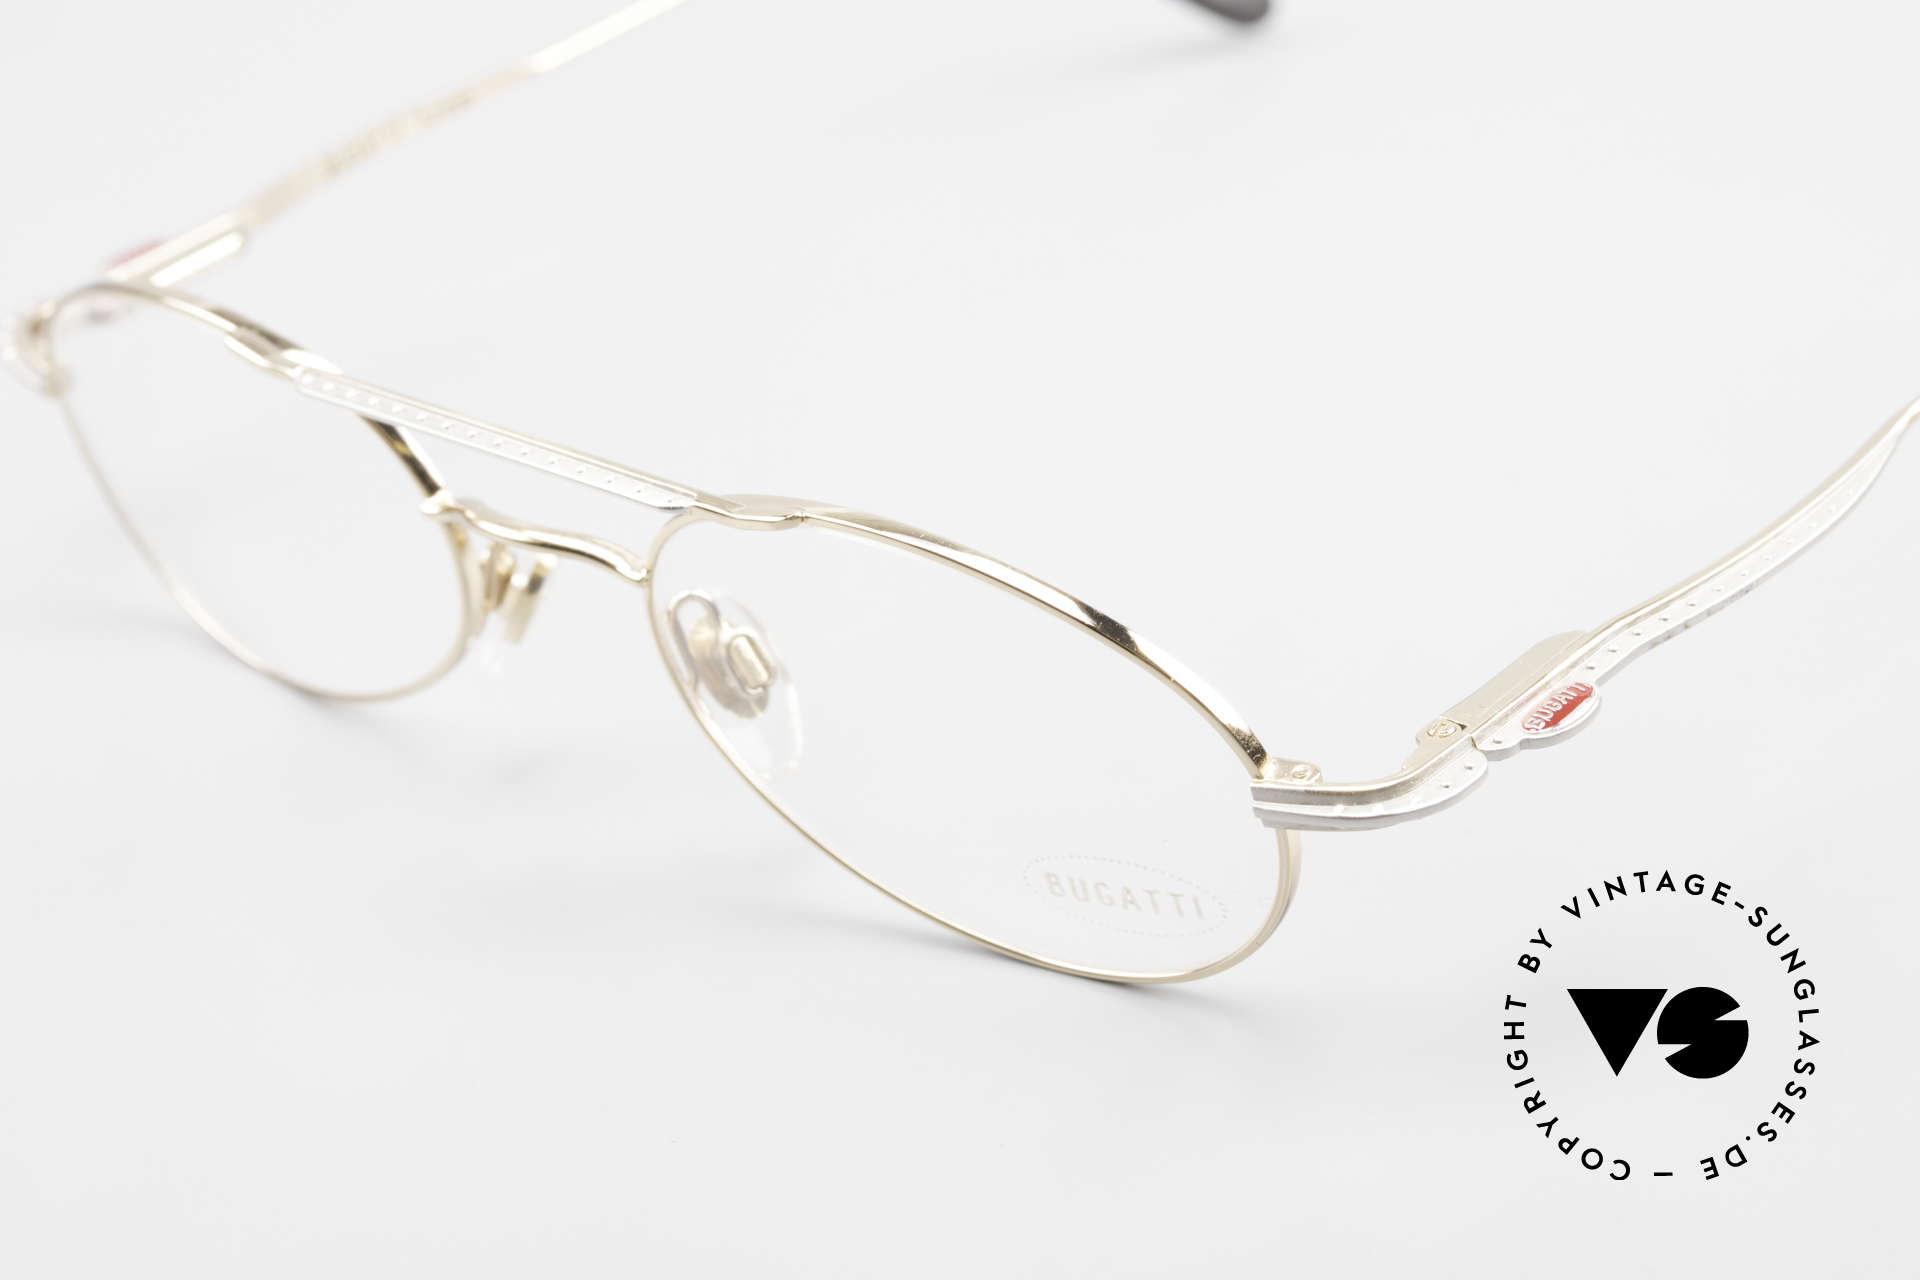 Bugatti 22996 Rare 90's Men's Eyeglass-Frame, made around 1995 in France; premium craftsmanship, Made for Men